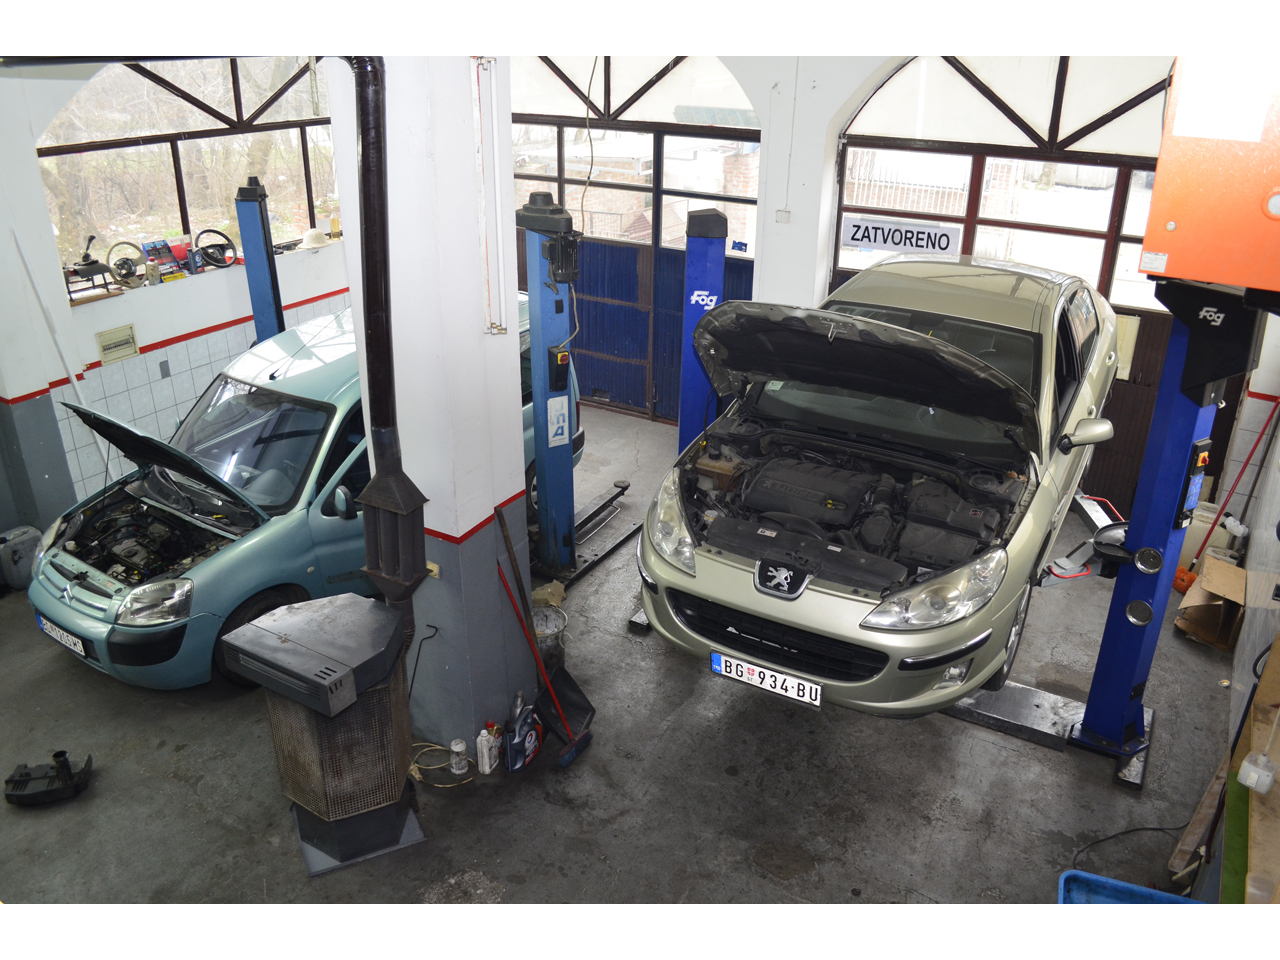 Euro Car Car Alarm Systems 2a Majevicka St Zemun Belgrade